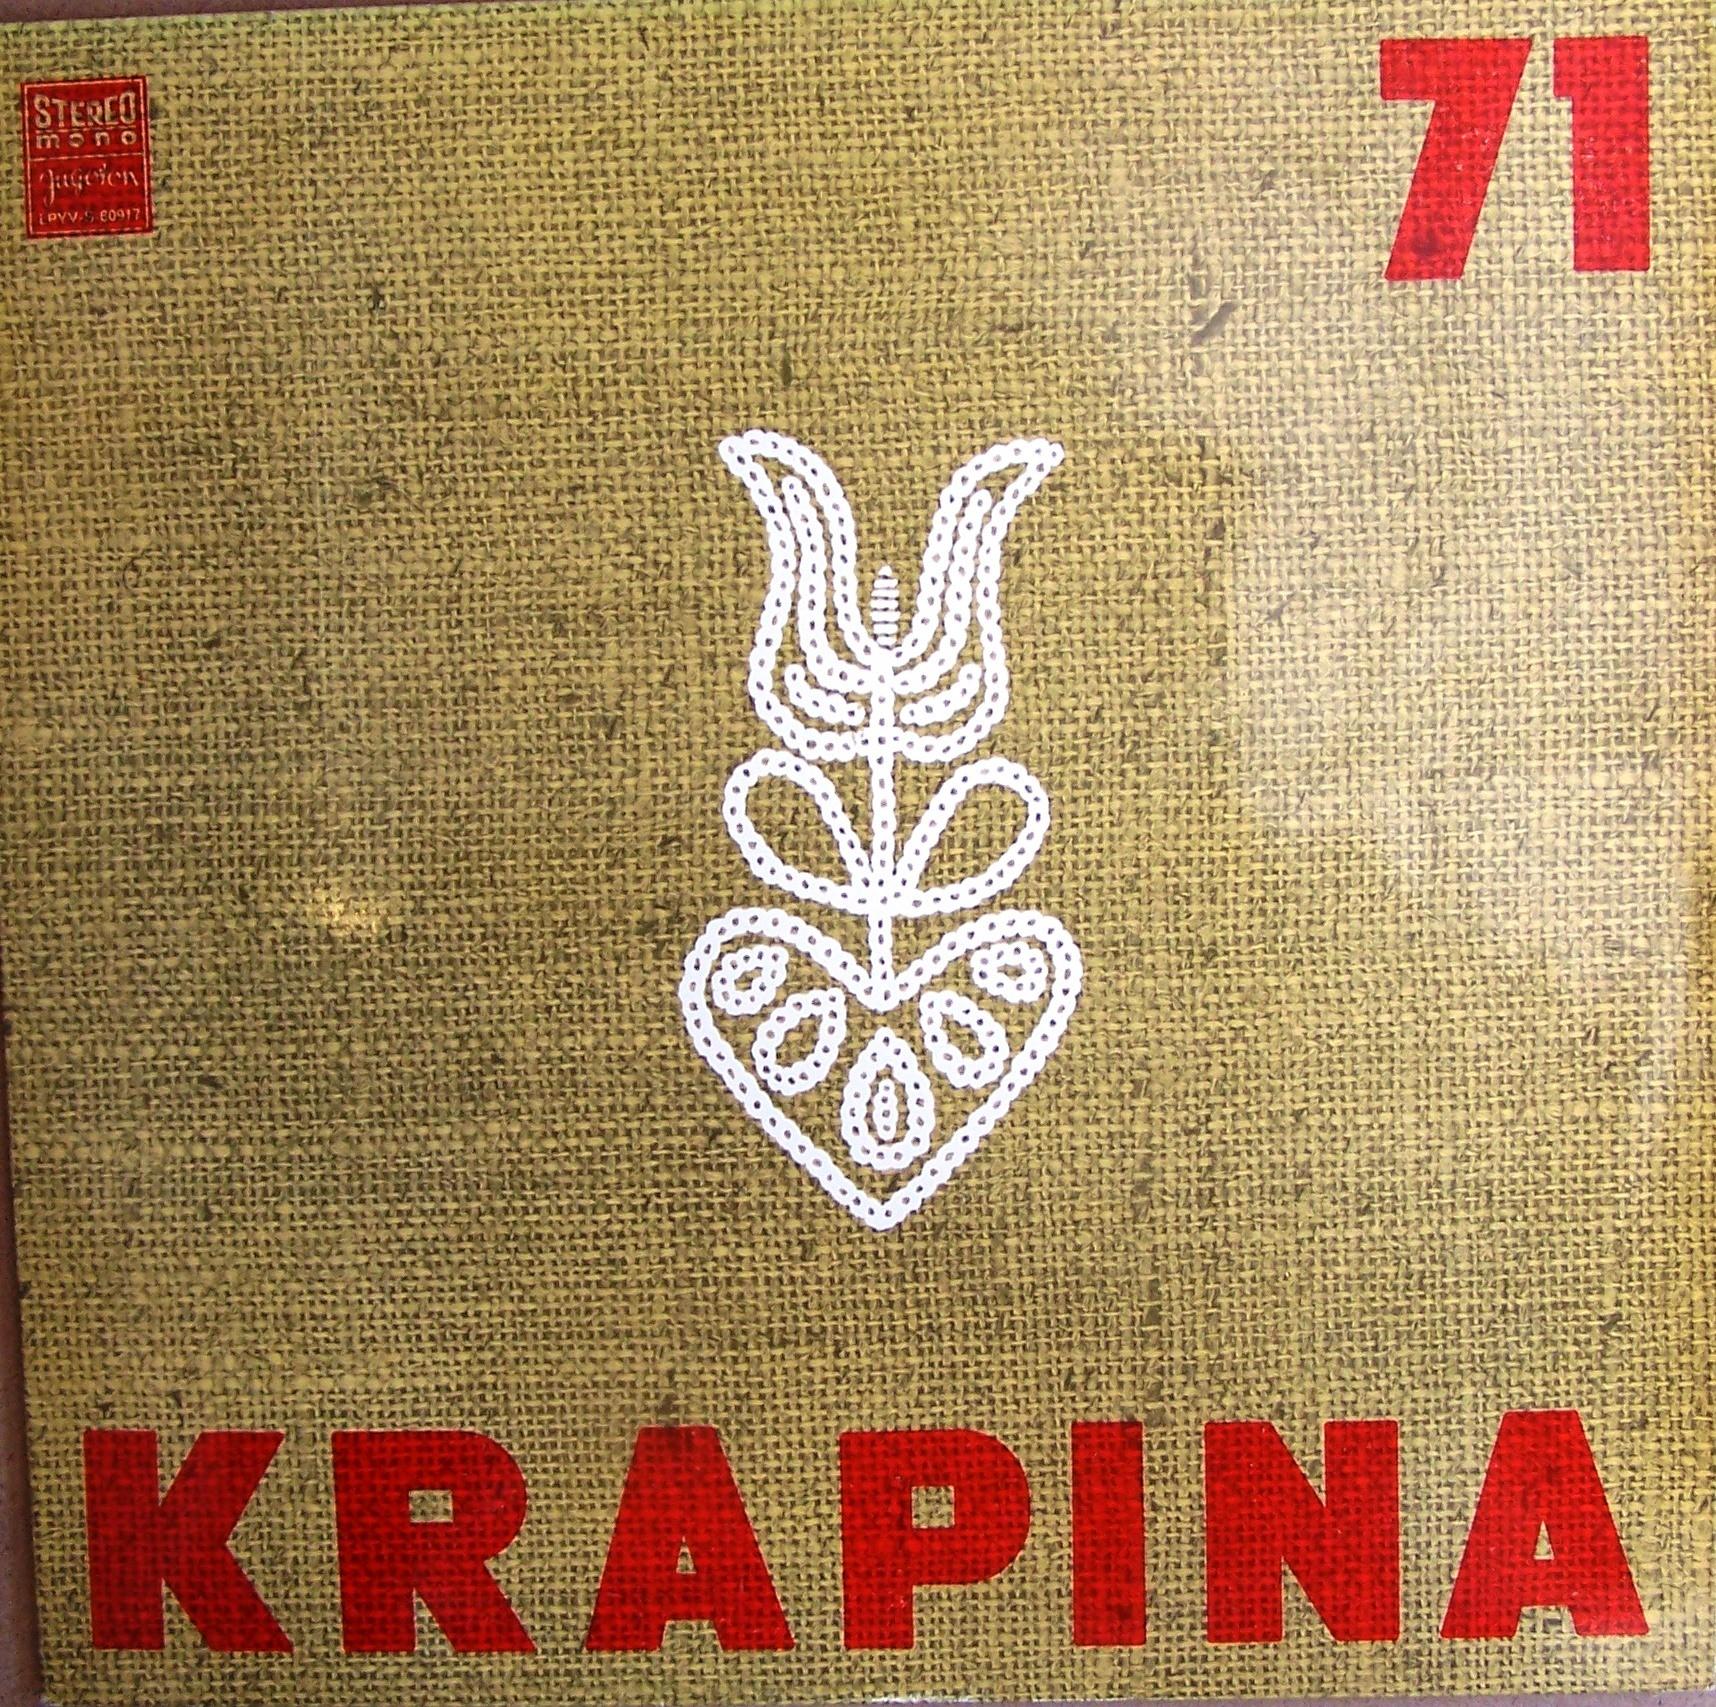 Various Artists - Krapina 1971 Mnovosel/gabi/iserfezi/irobic Etc